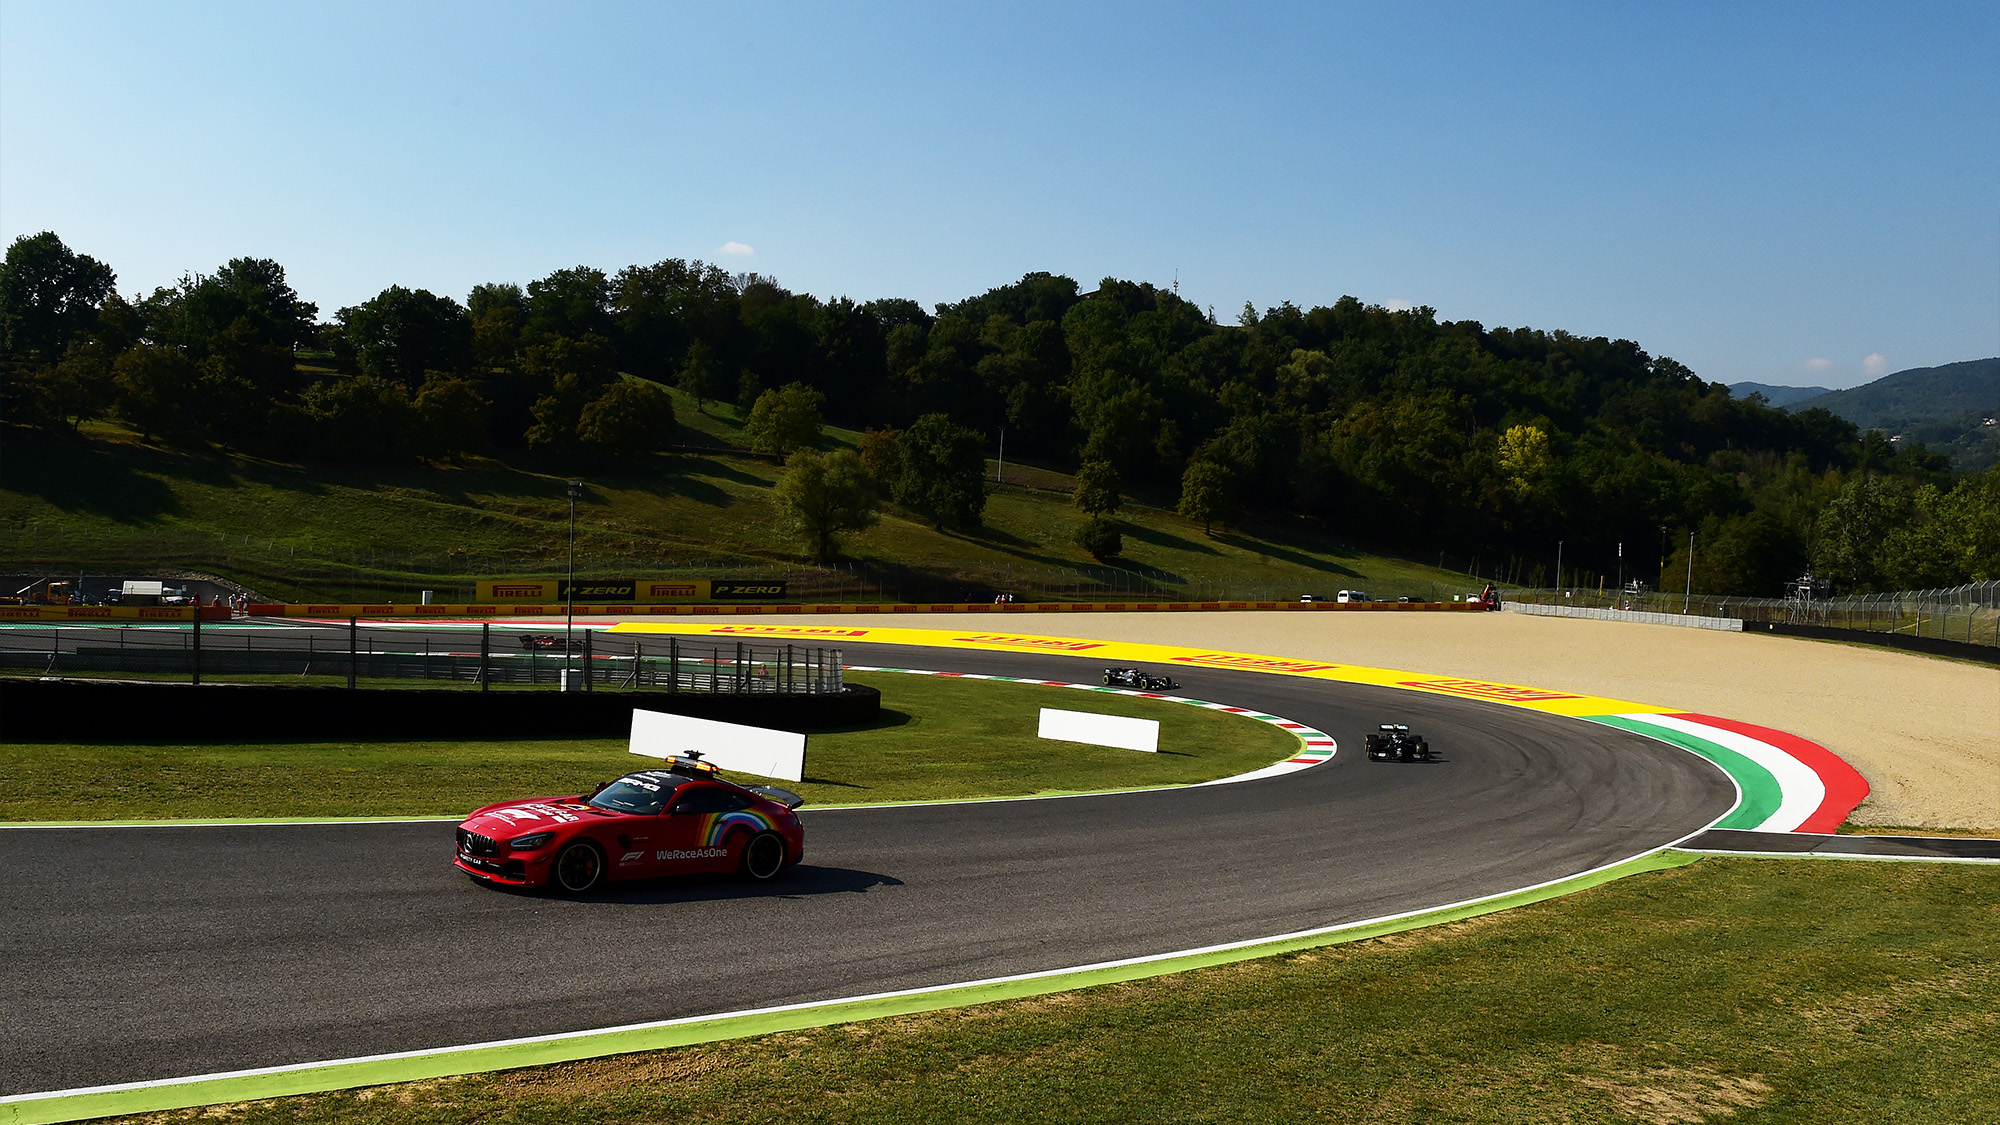 Safety car at Mugello during the 2020 F1 Tuscan Grand Prix